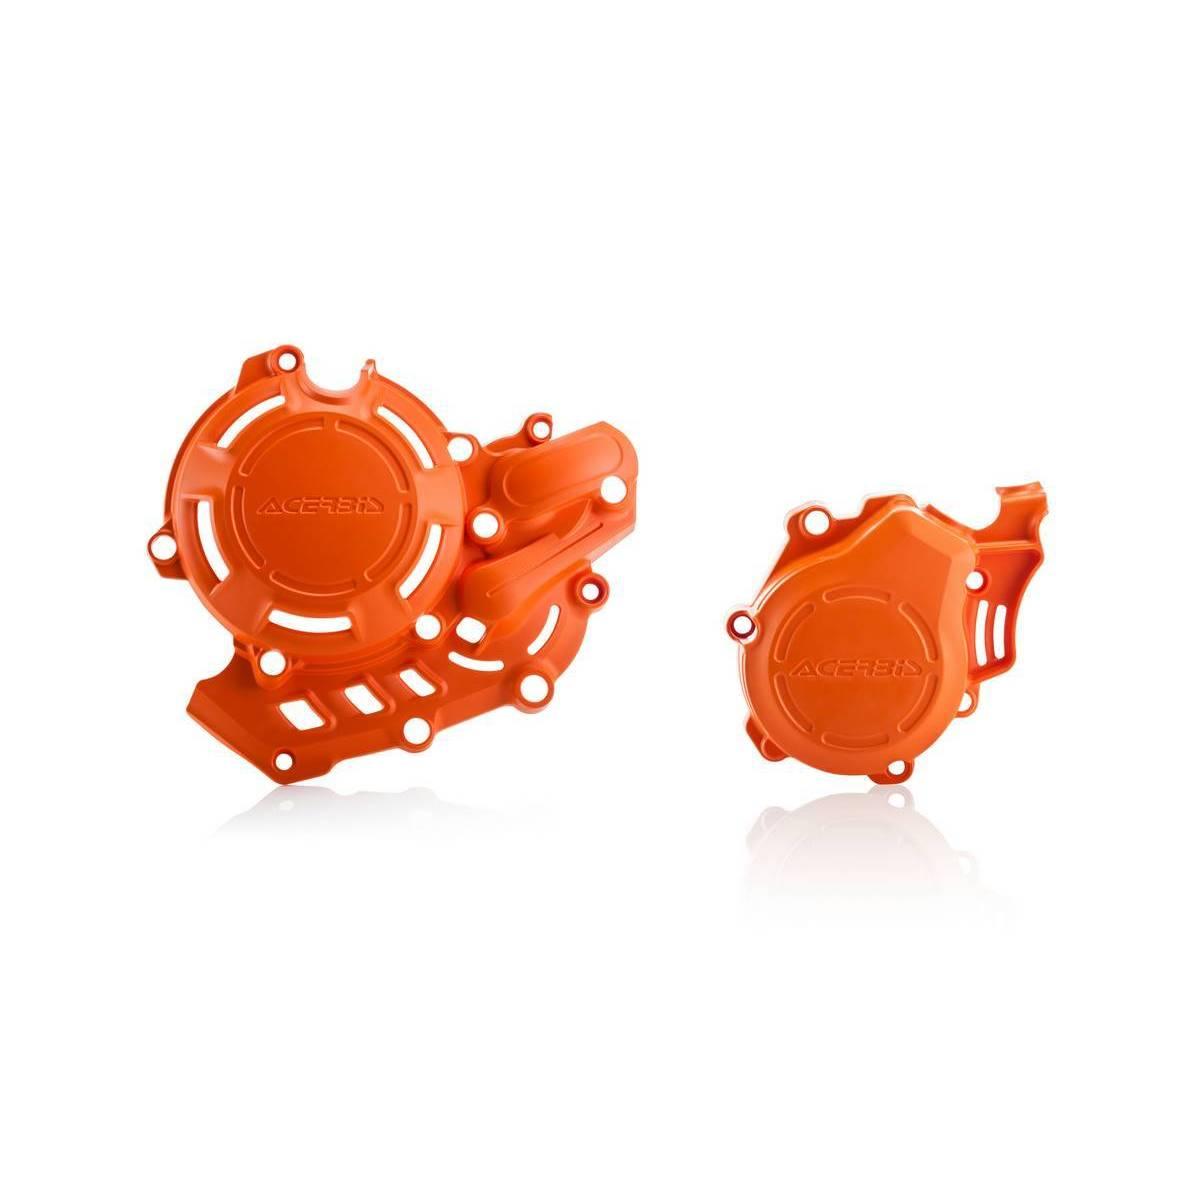 0023153-011 - Kit X Power Acerbis Ktm Hva Naranja